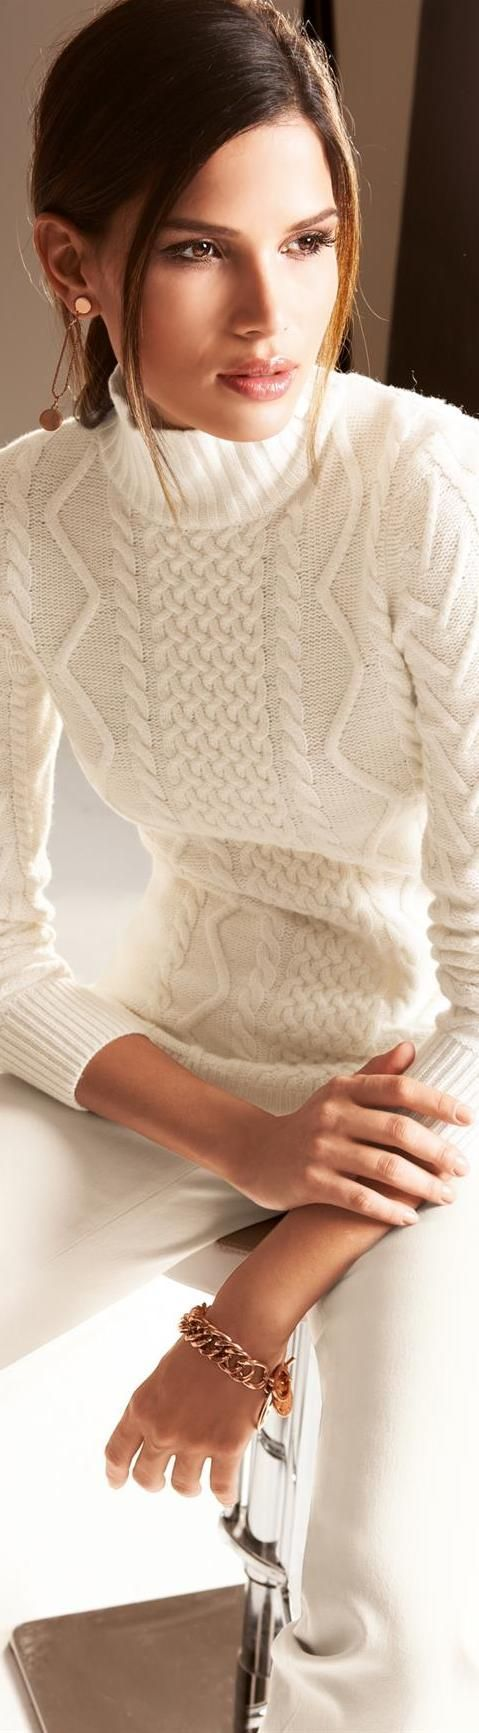 #Trico/Knitting